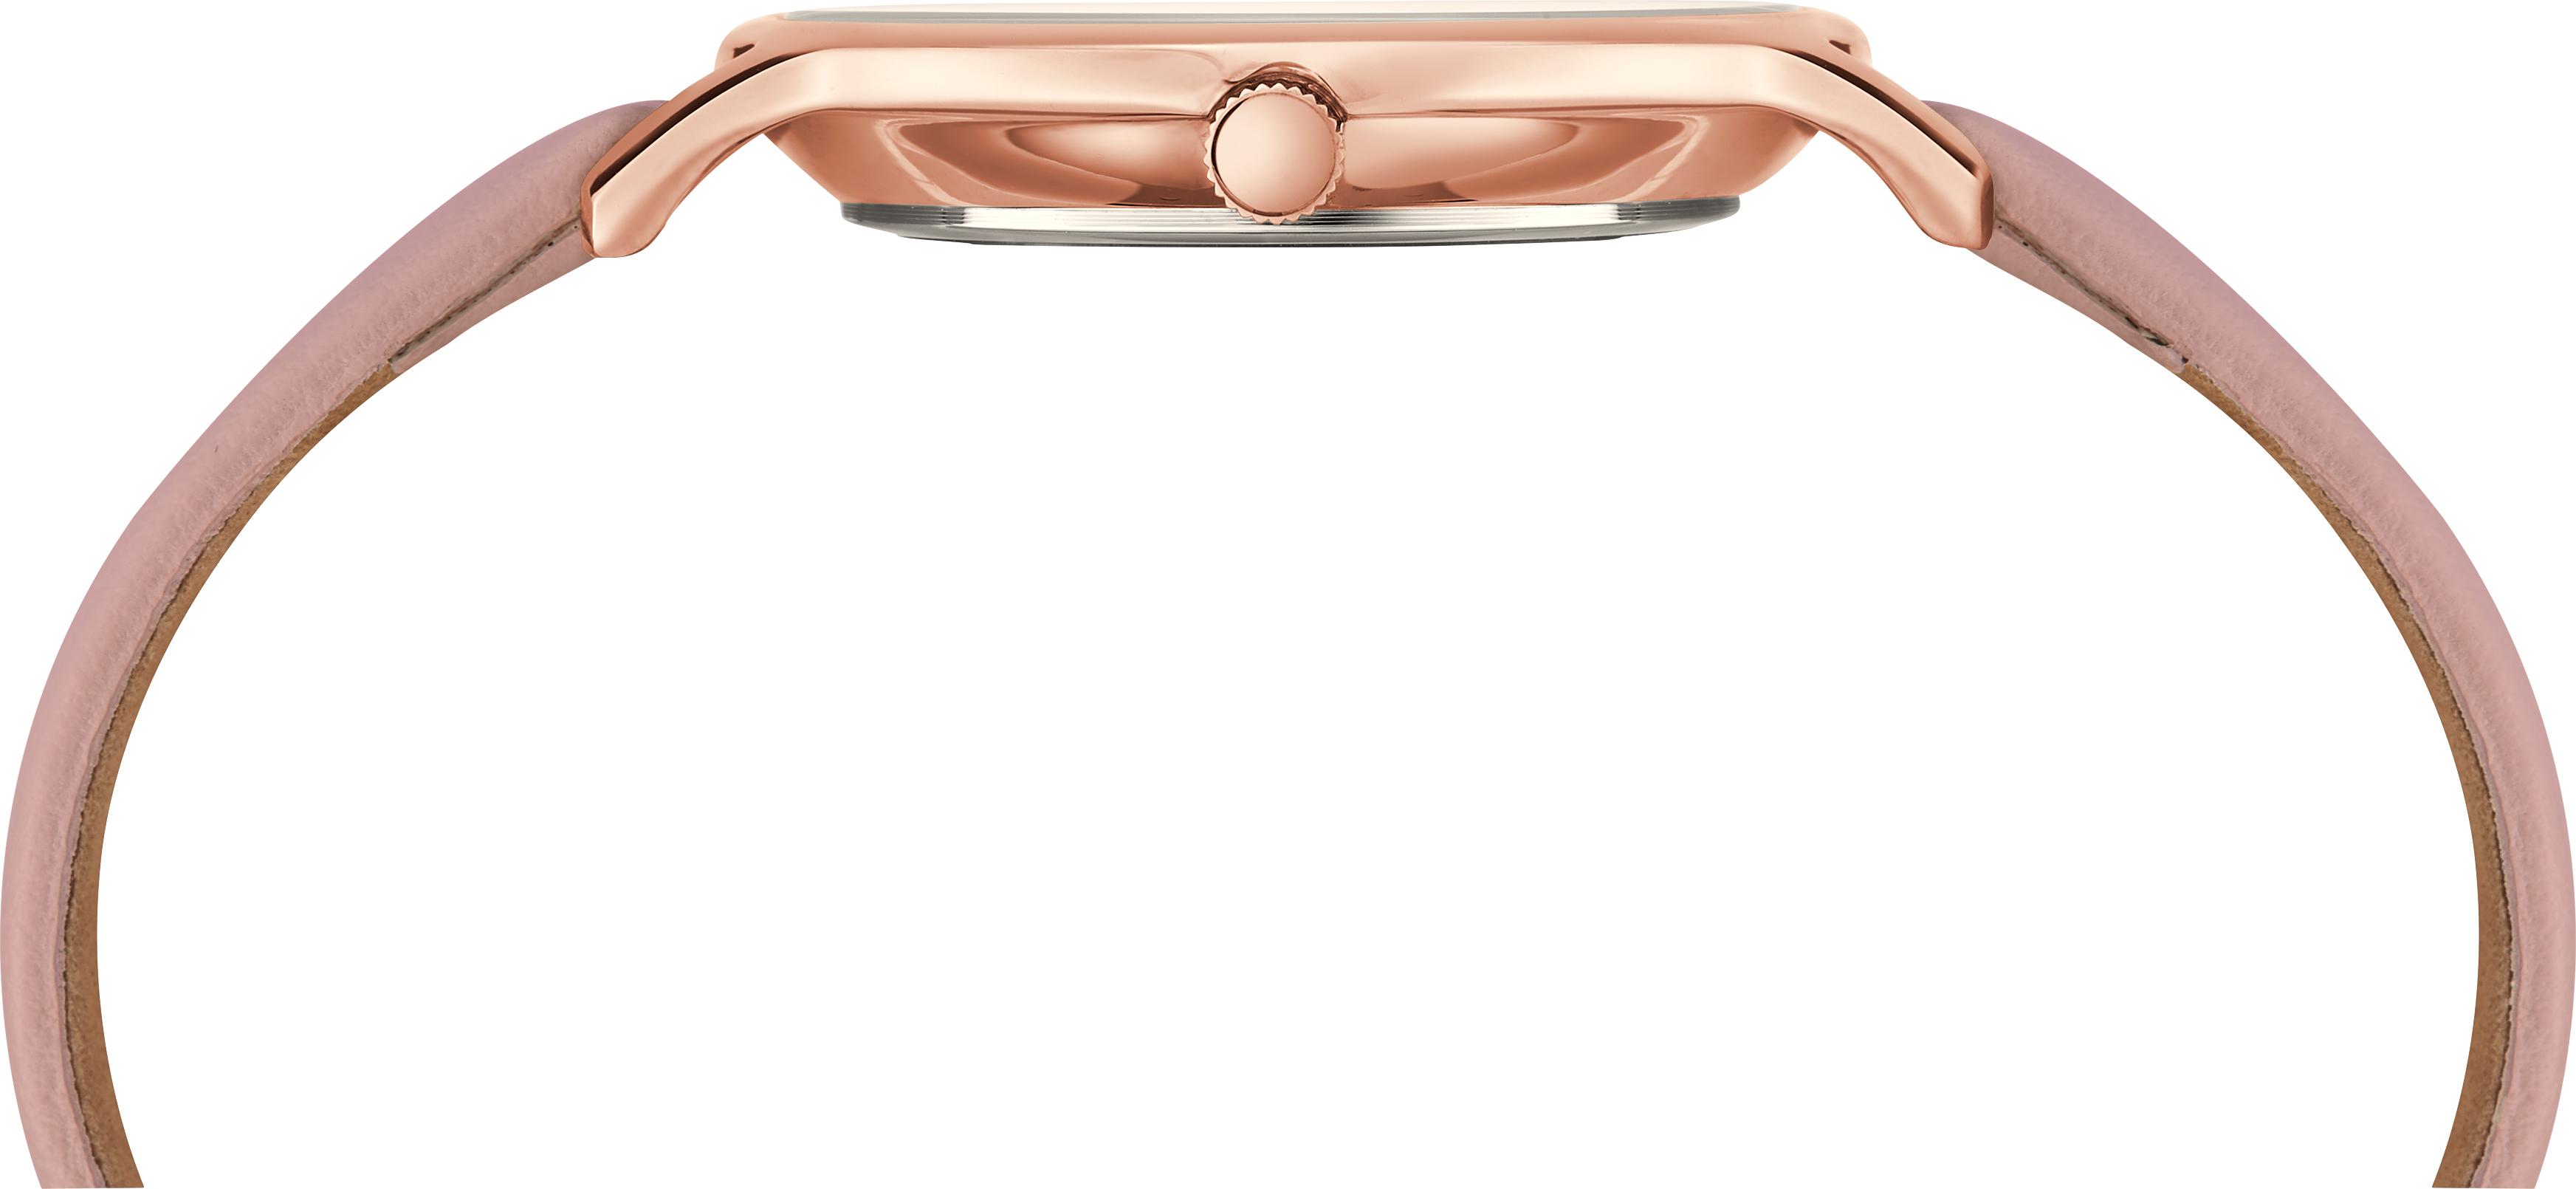 Đồng hồ Dây Da Nữ Timex Metropolitan 34mm Rose Gold Case MOP Dial Blush Leather Strap - TW2T36100